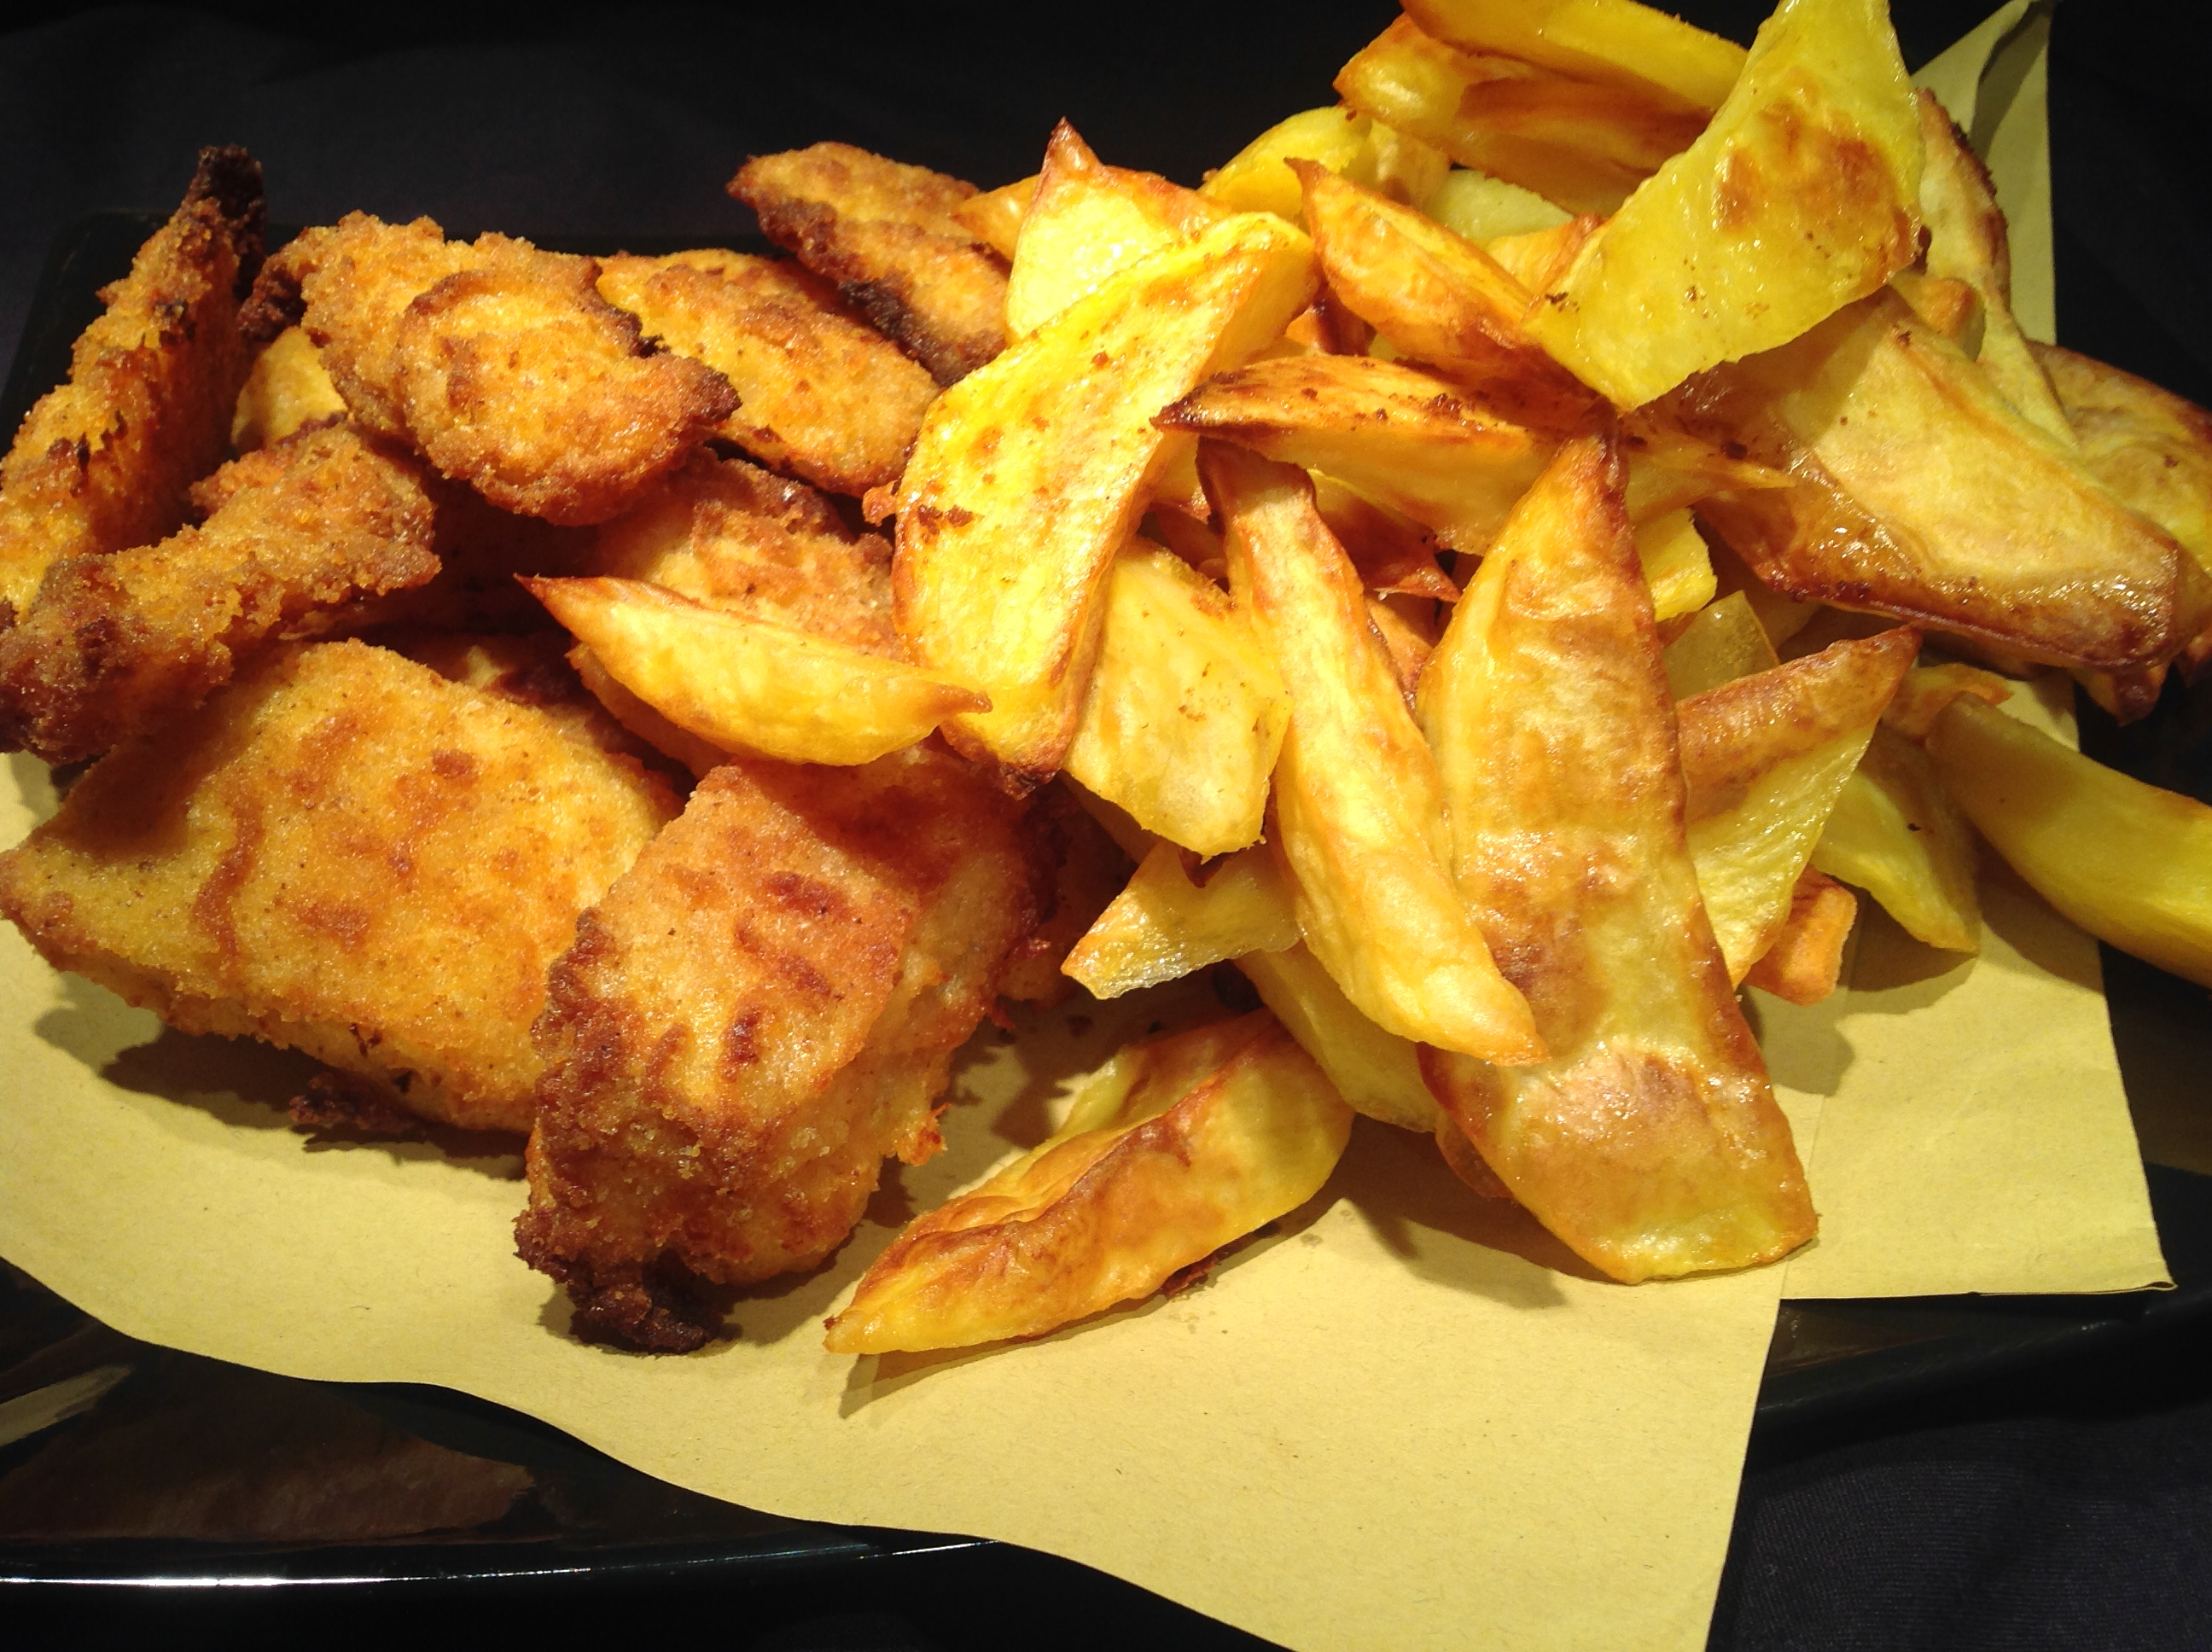 Baccalà fish and chips al forno